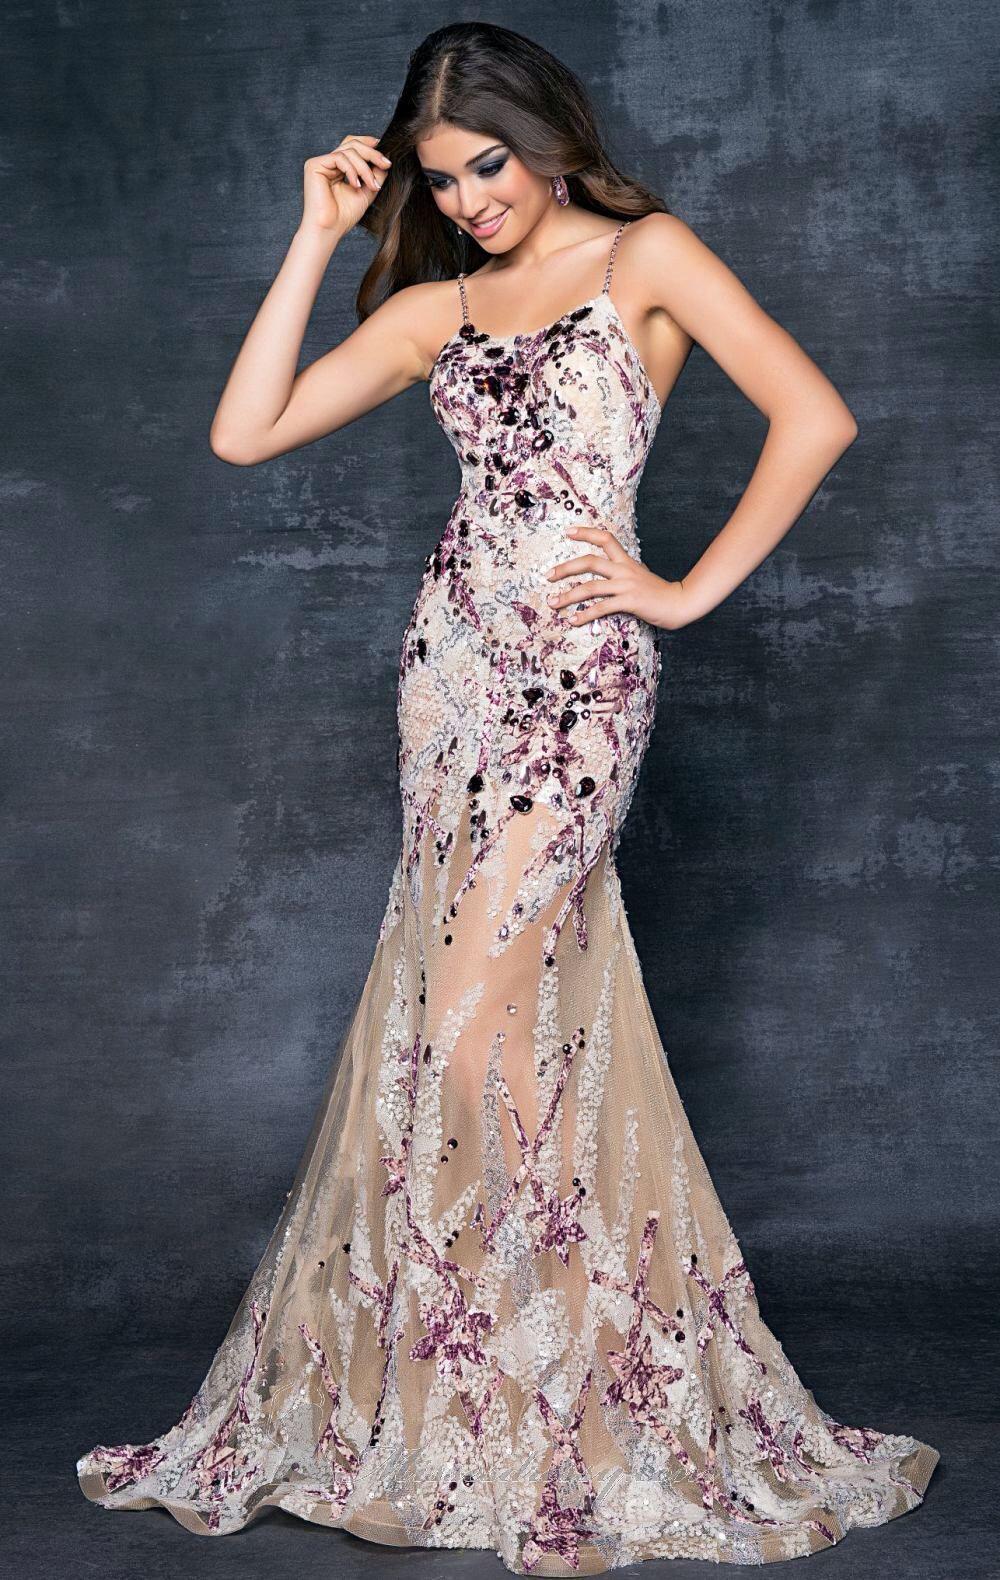 Prom dress Prom dresses Pinterest Prom Banquet dresses and